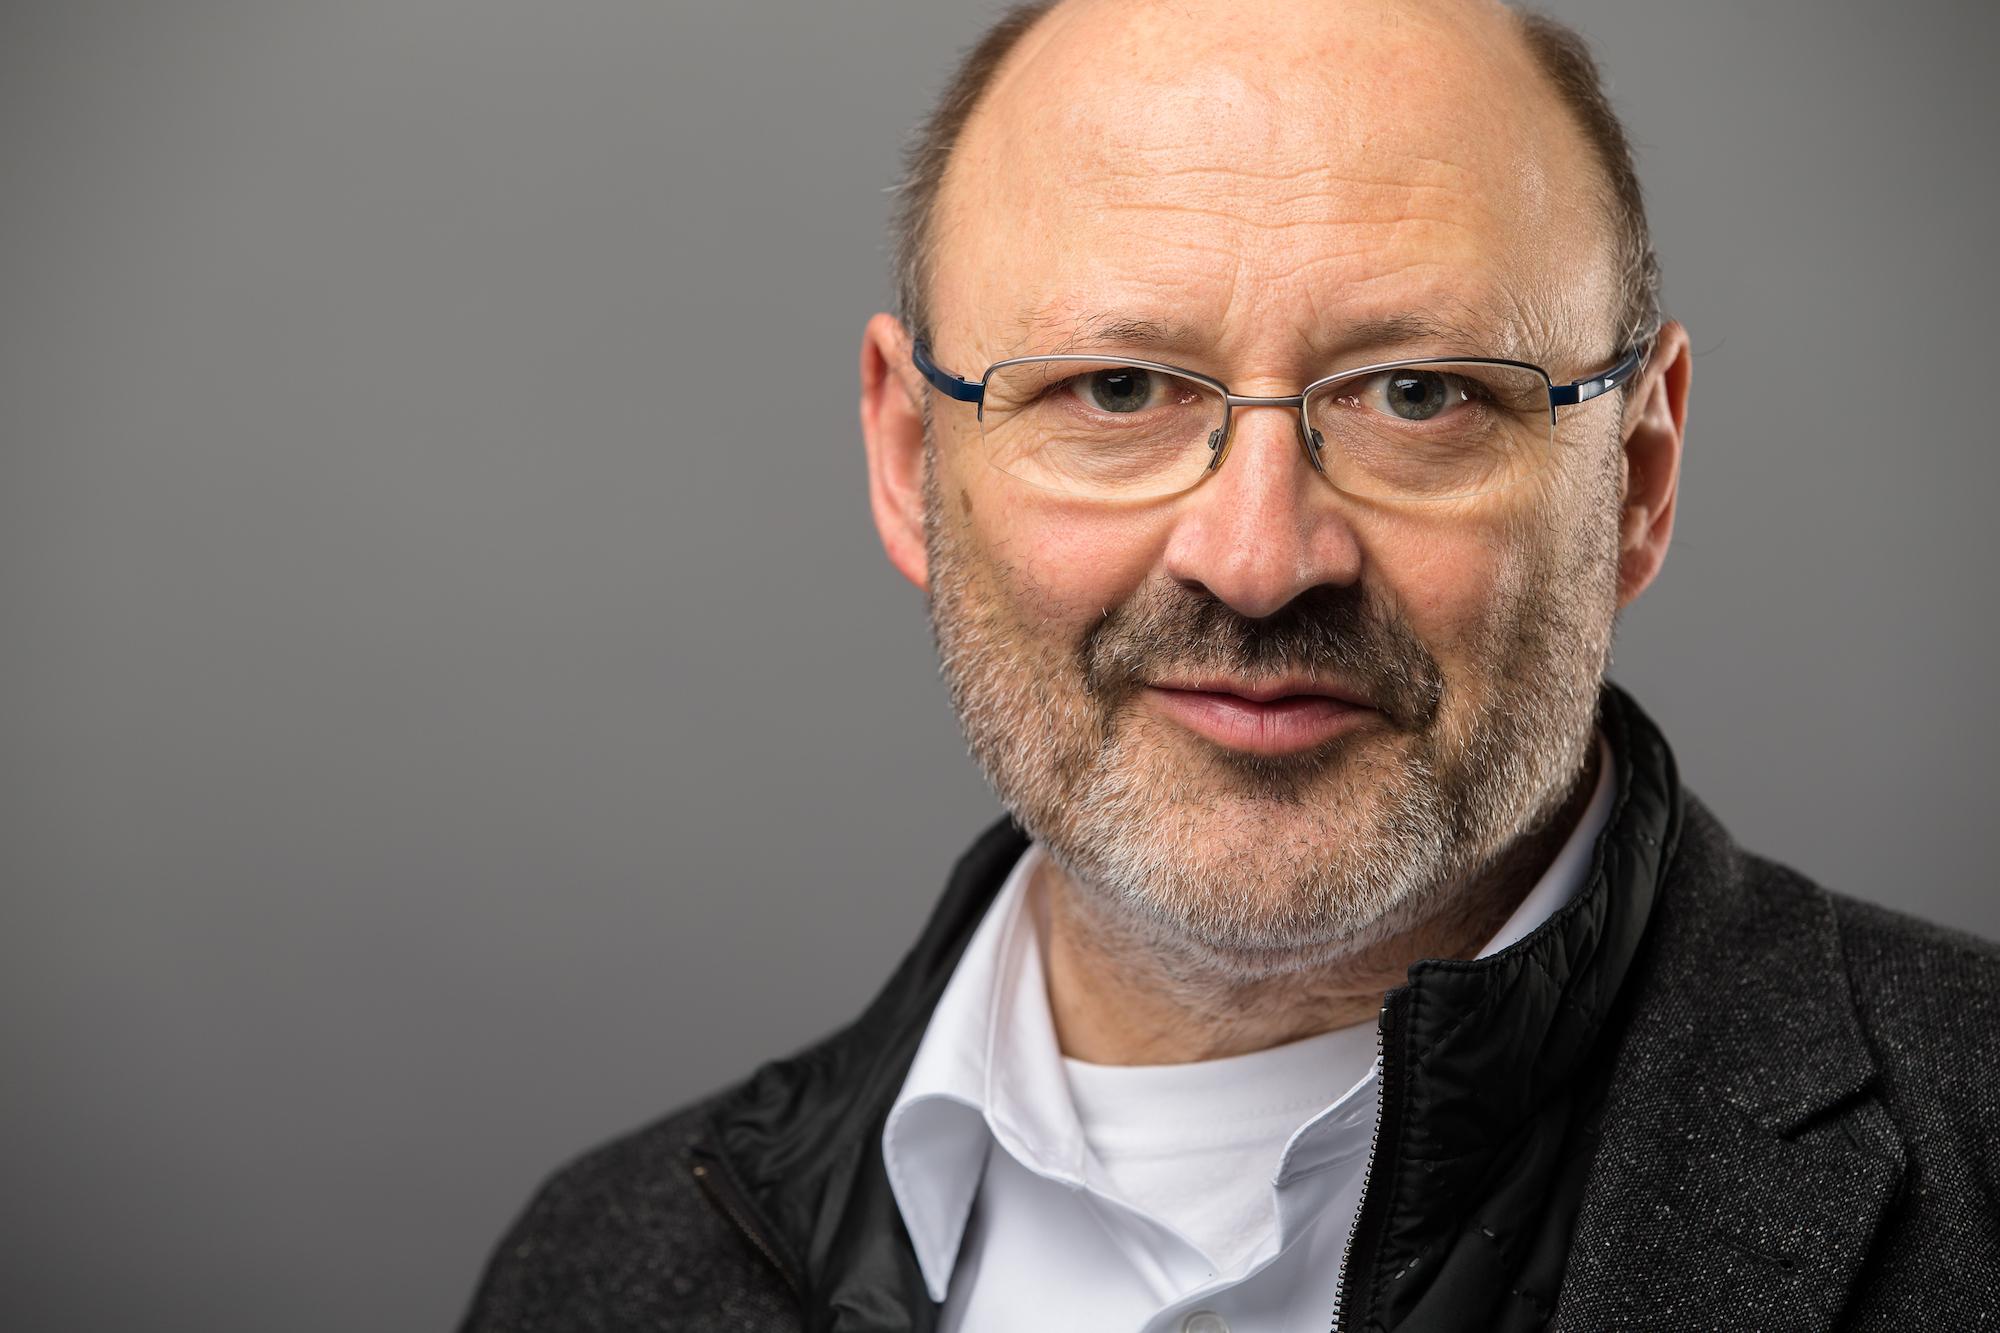 Prof Rainer Banse Master Rechtspsychologie